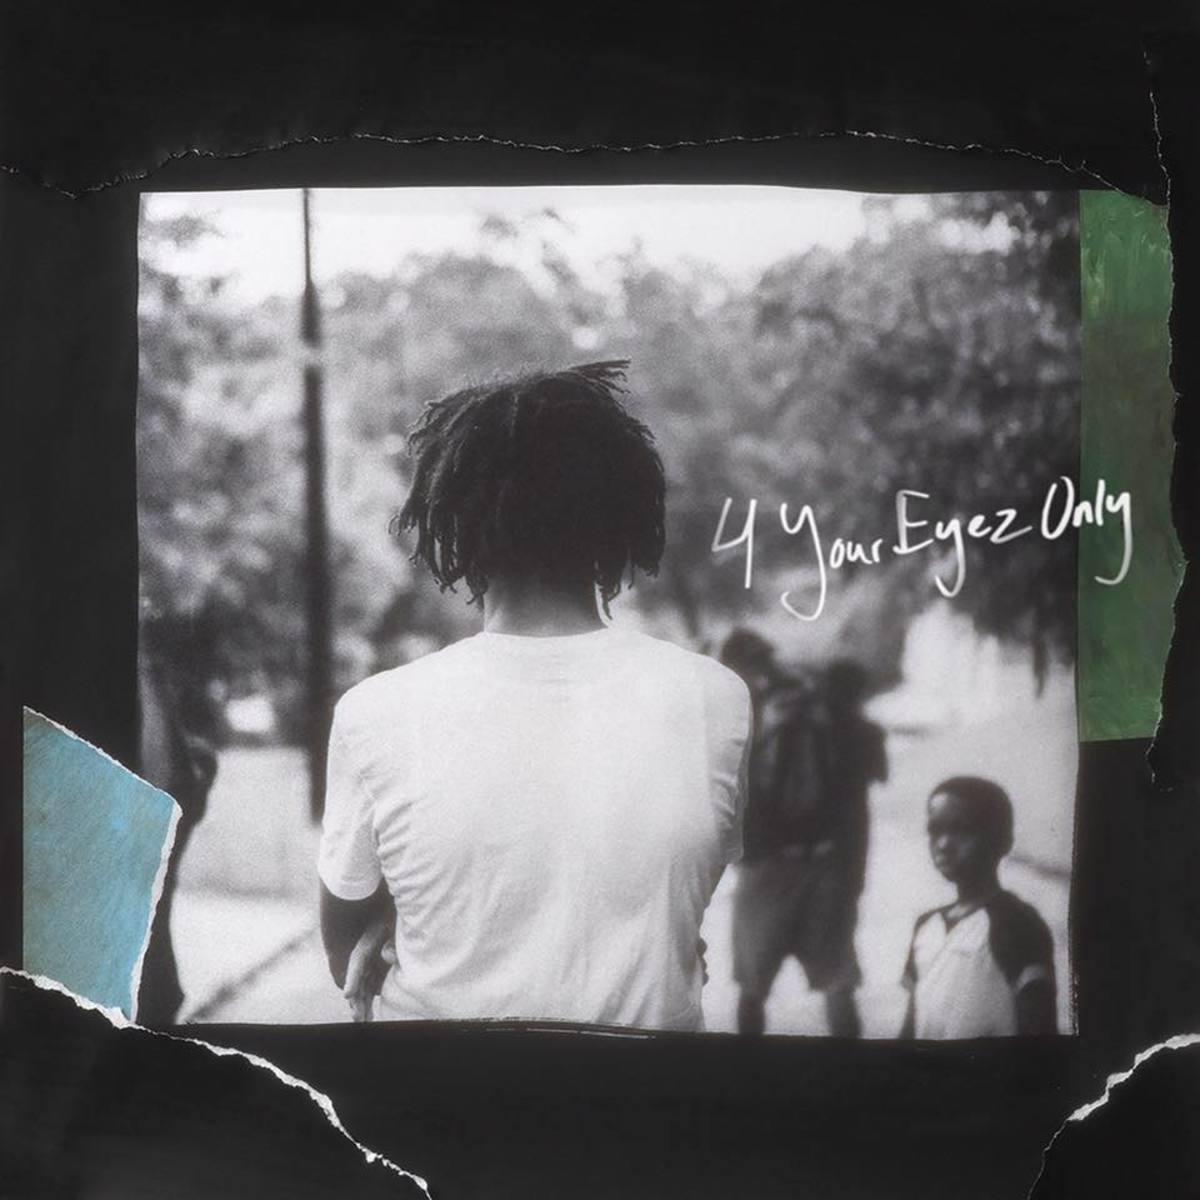 review-j-coles-album-4-your-eyez-only